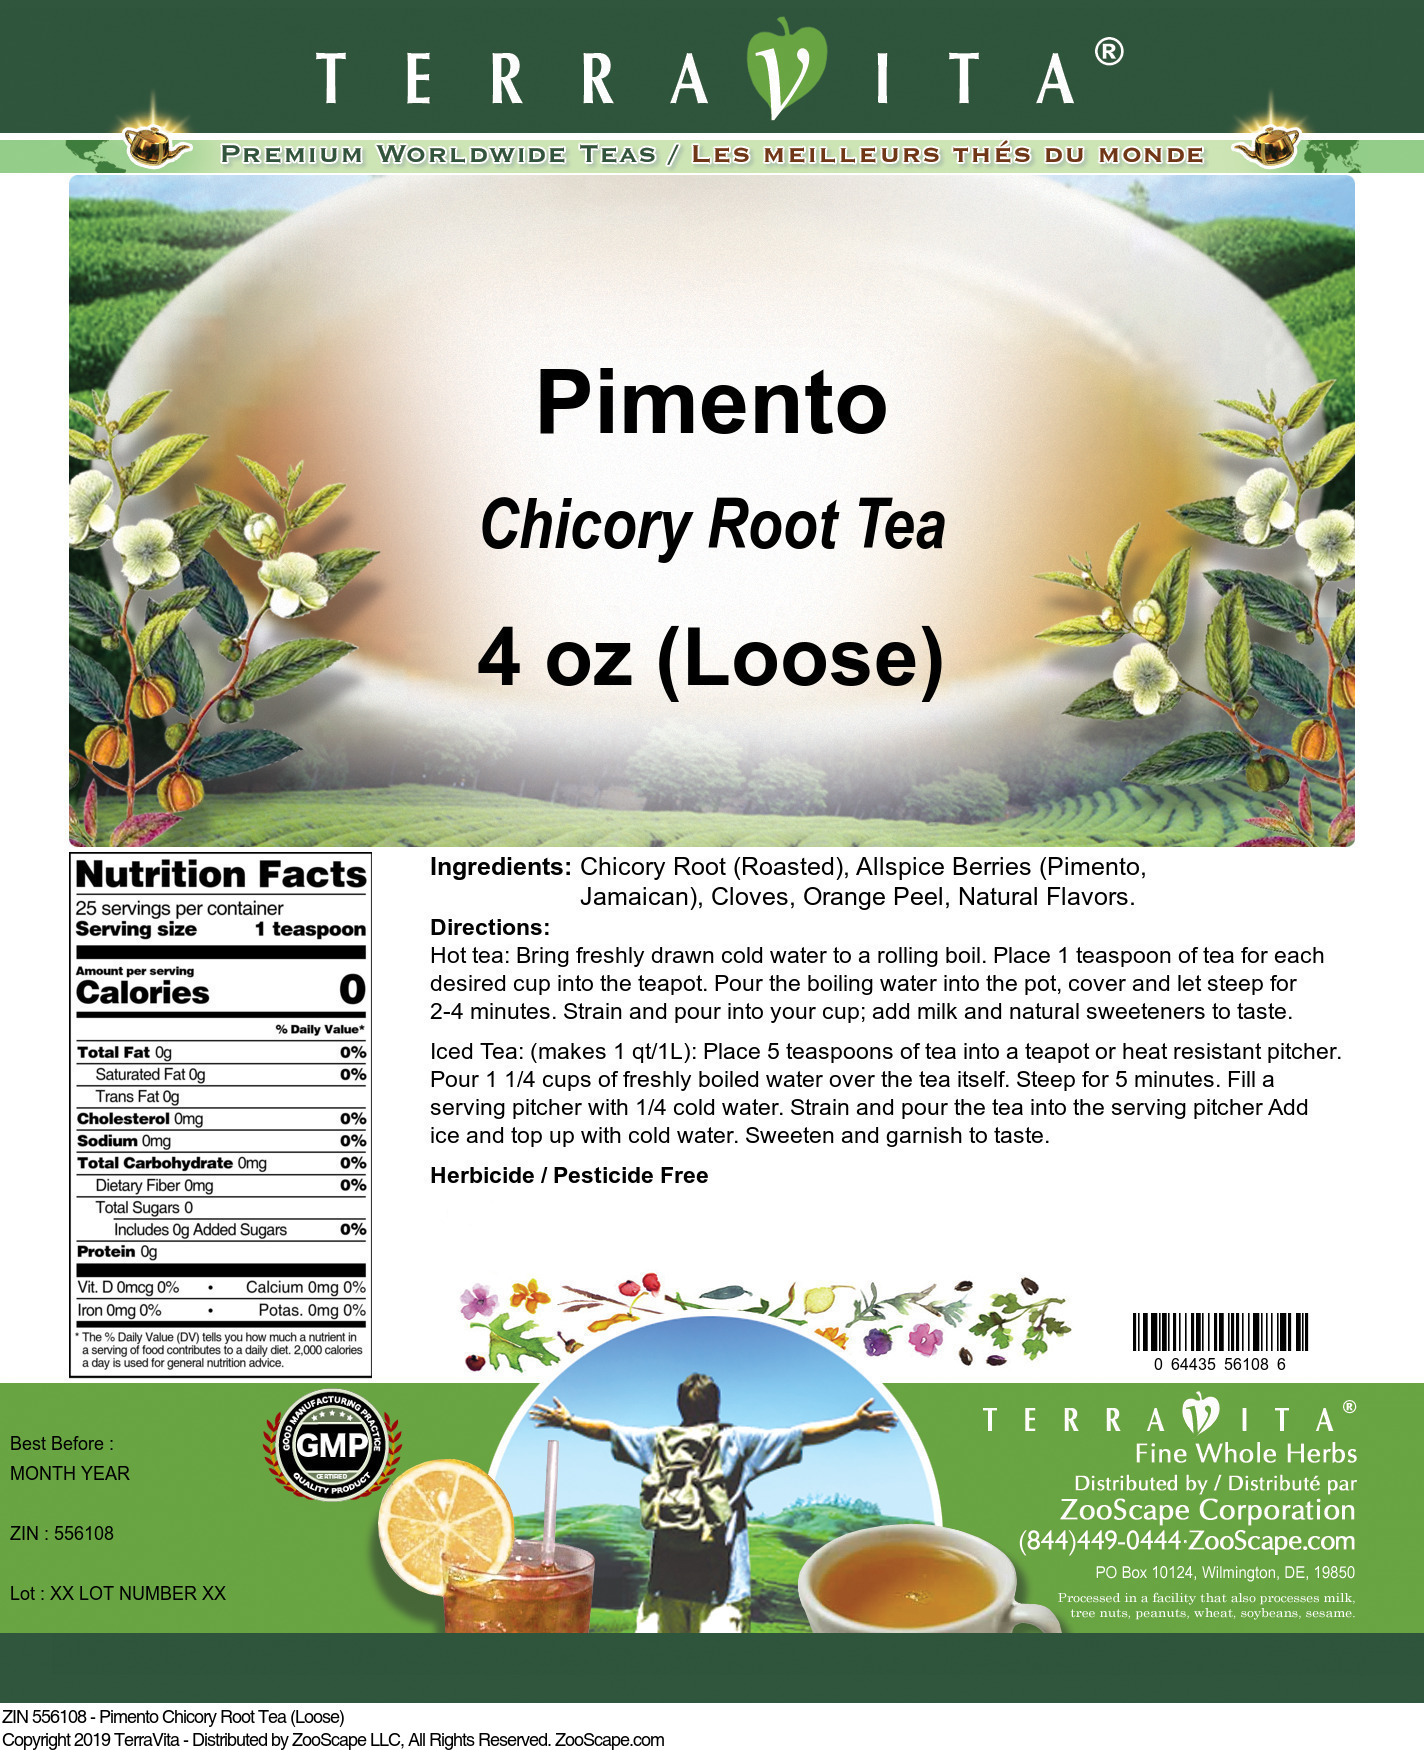 Pimento Chicory Root